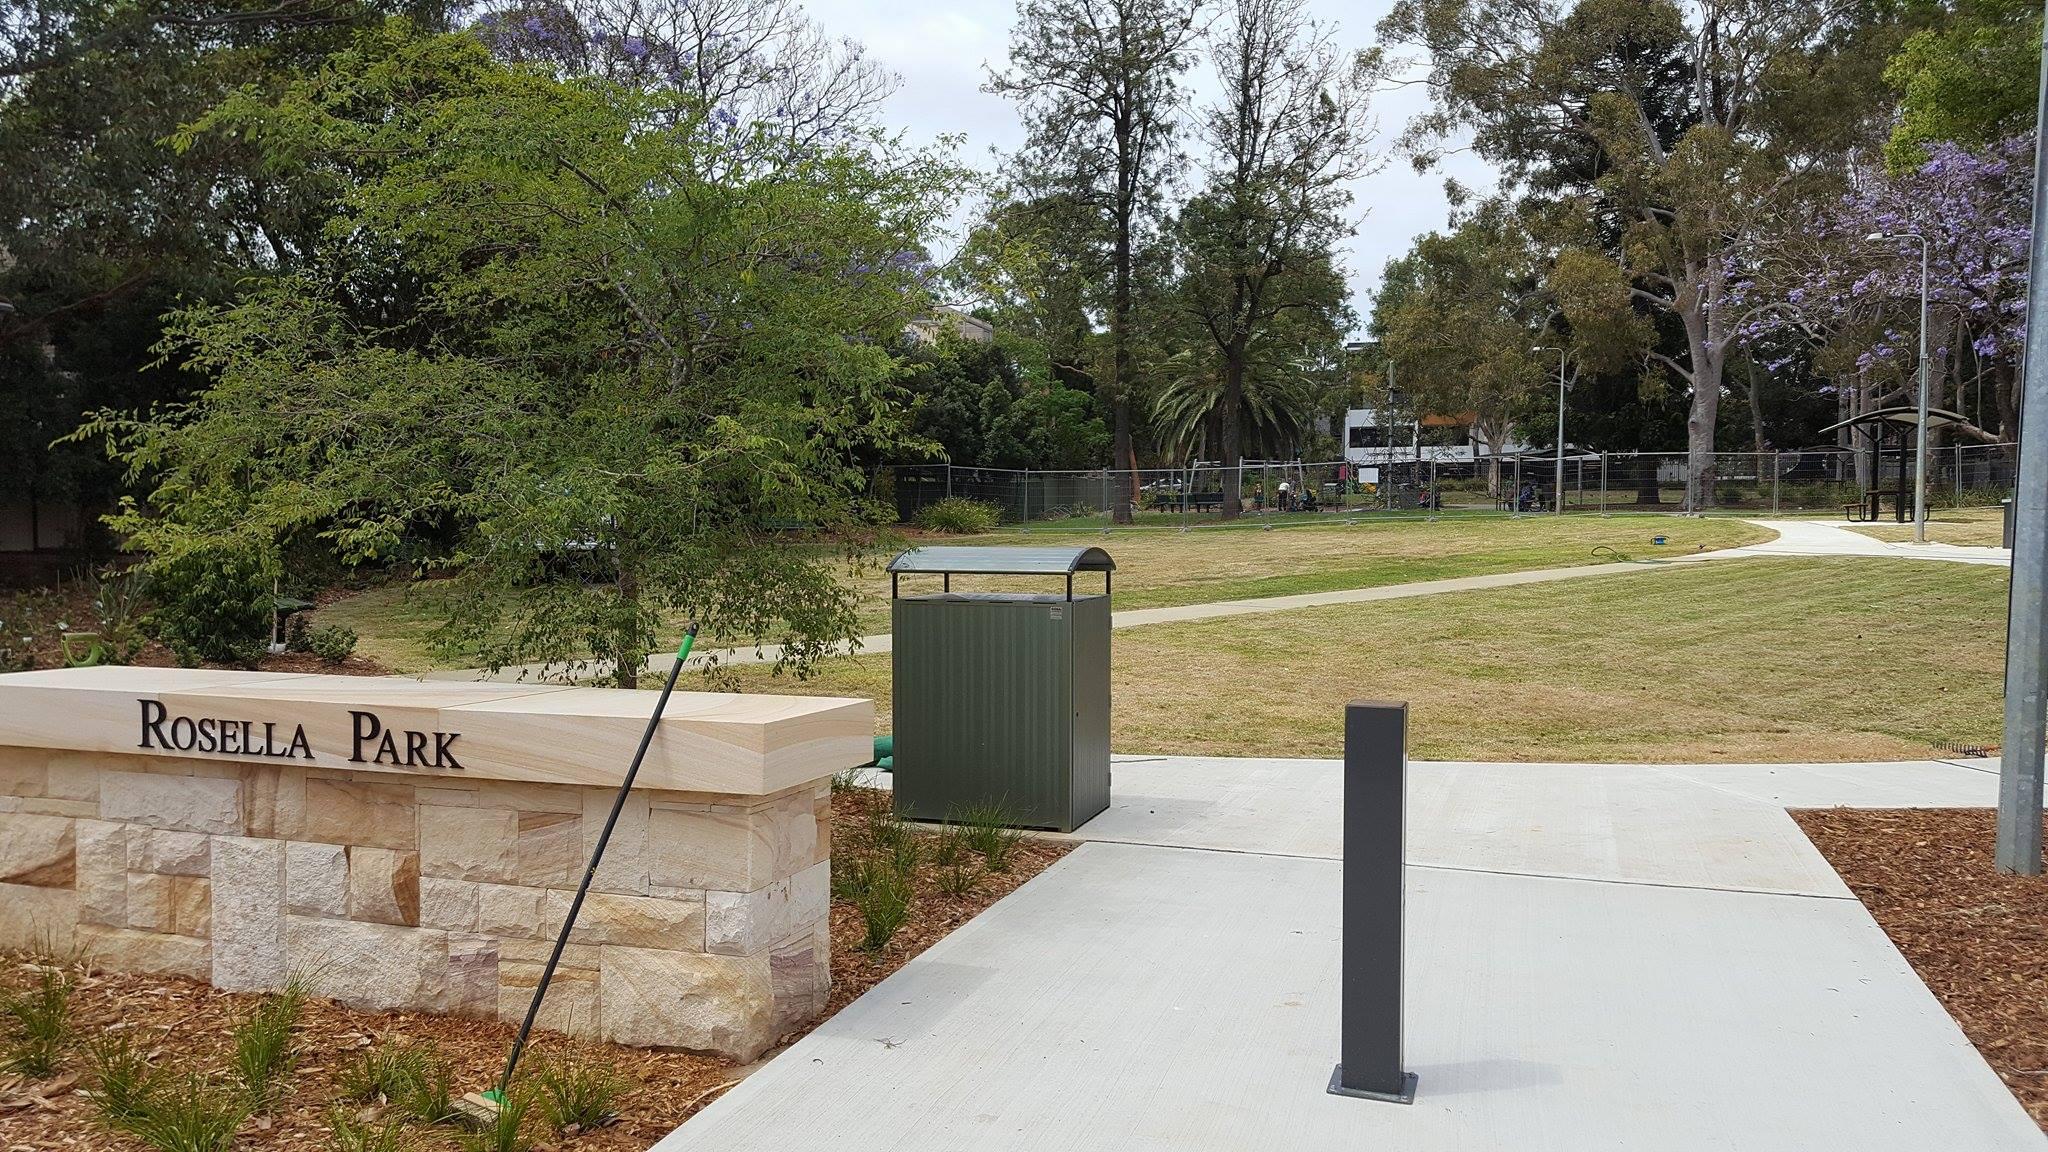 Rosella Park